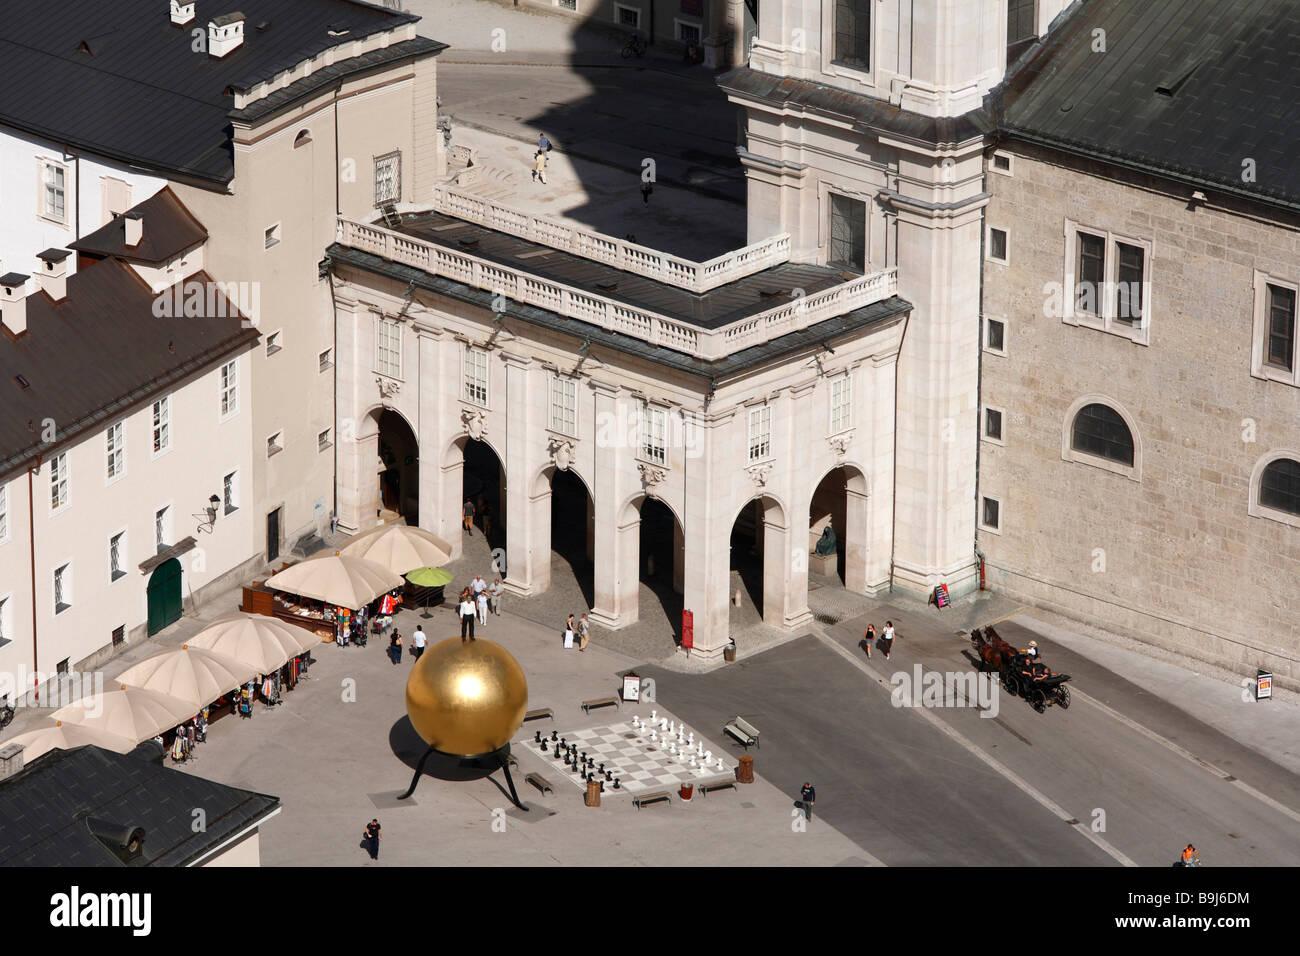 Kapitelplatz con l'oggetto d'arte 'phaera' da Stephan Balkenhol, Salisburgo, Austria, Europa Immagini Stock